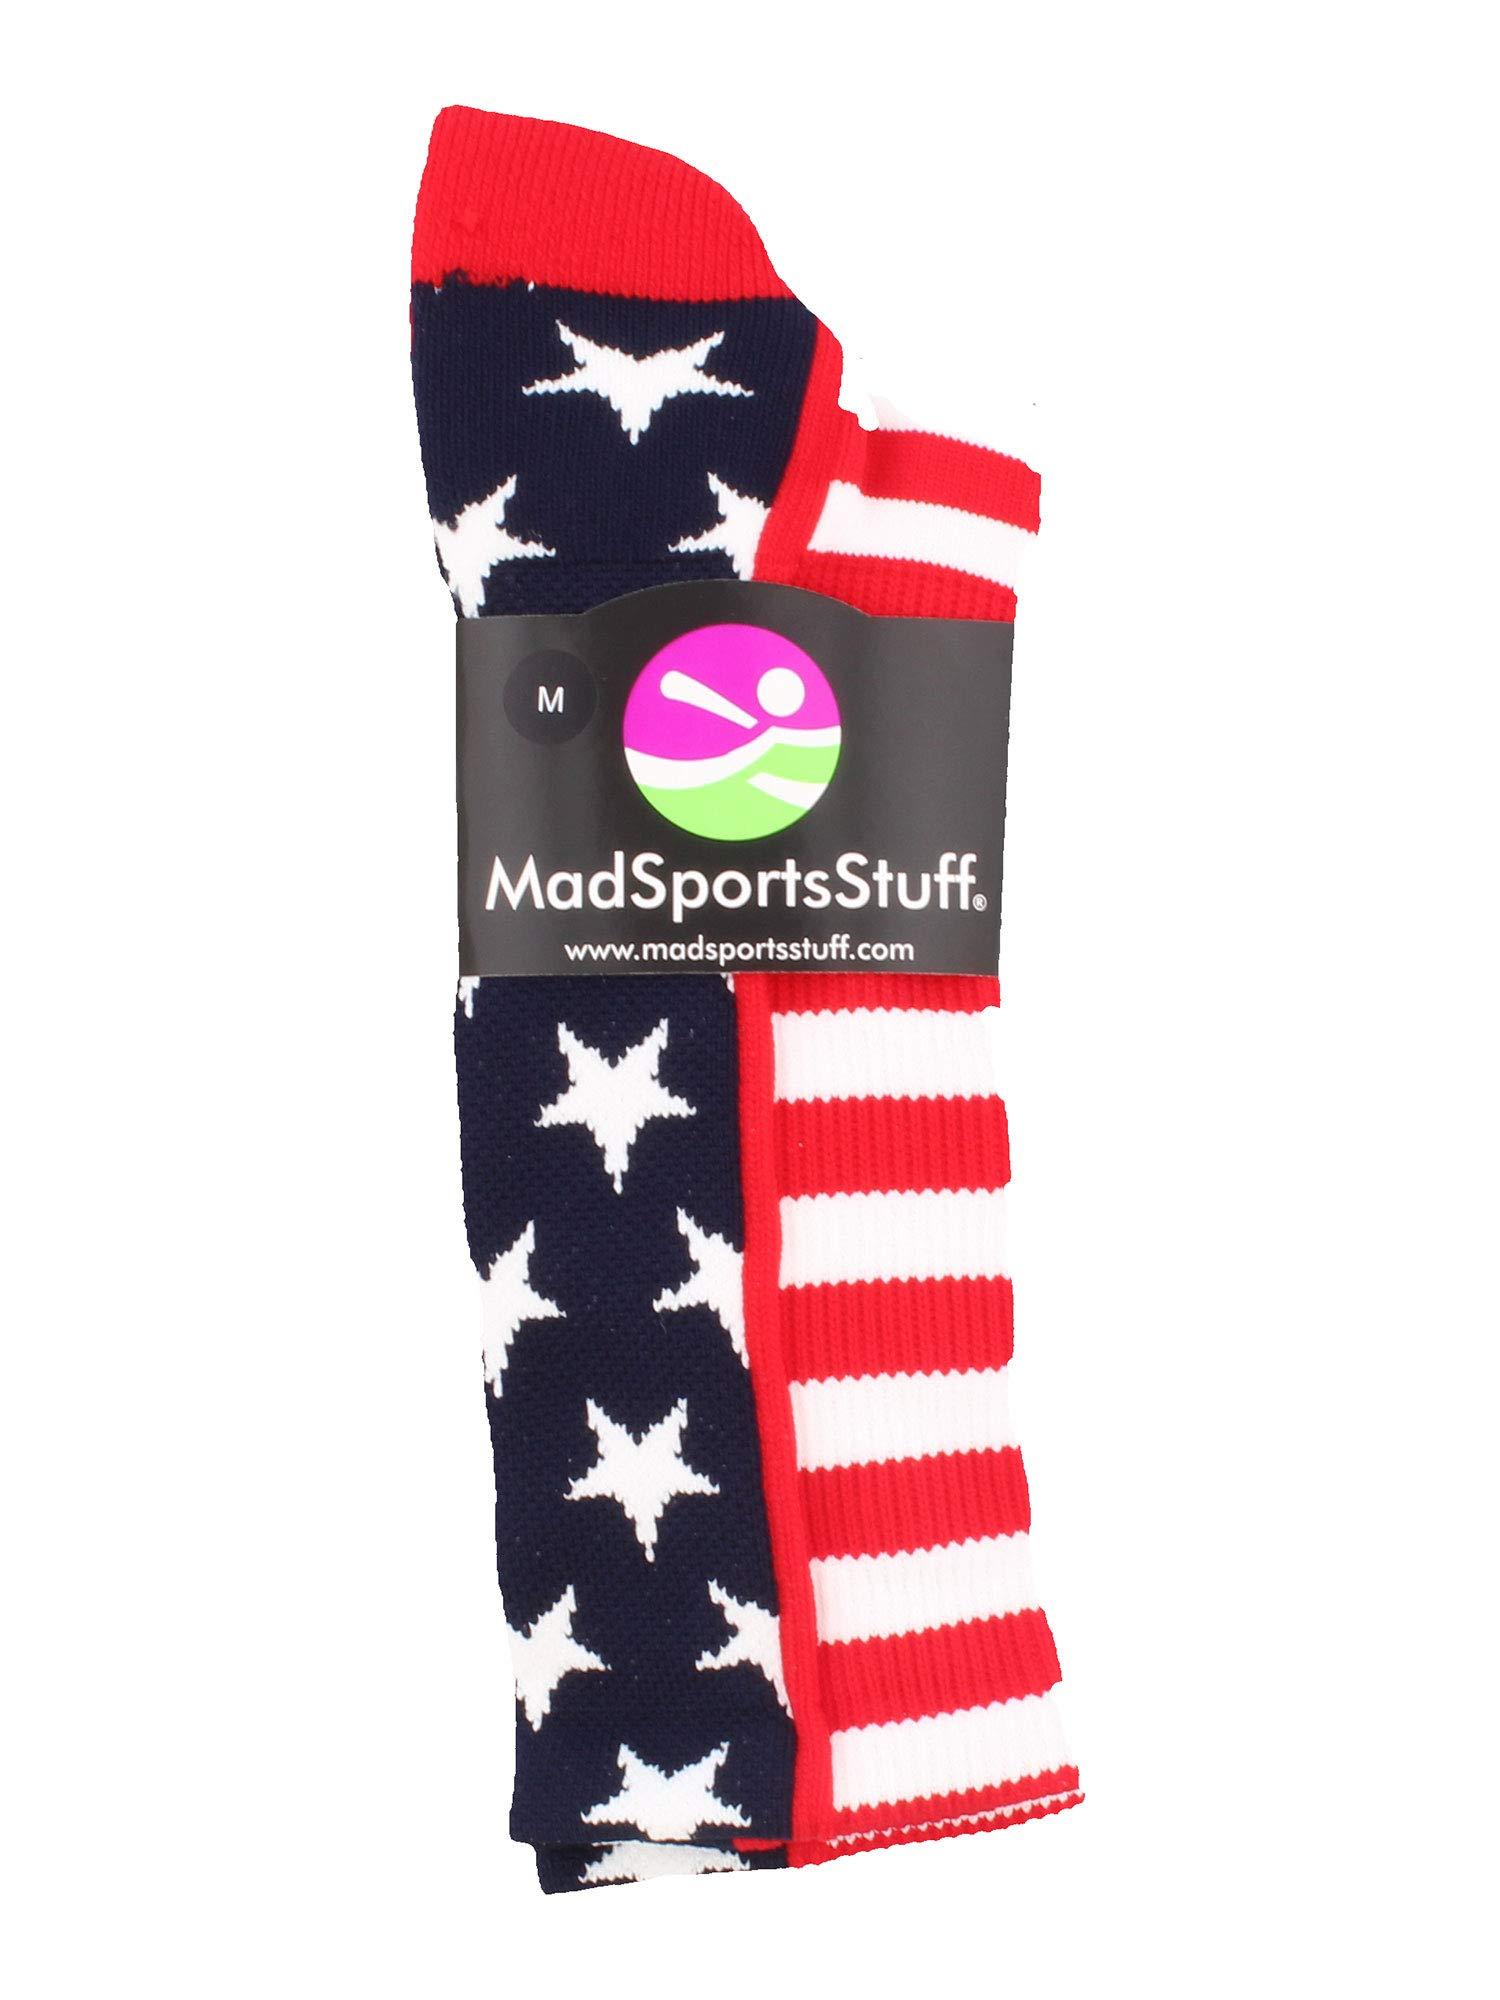 MadSportsStuff USA American Flag Stars Stripes Crew Socks (Navy/Red/White, Small) by MadSportsStuff (Image #2)